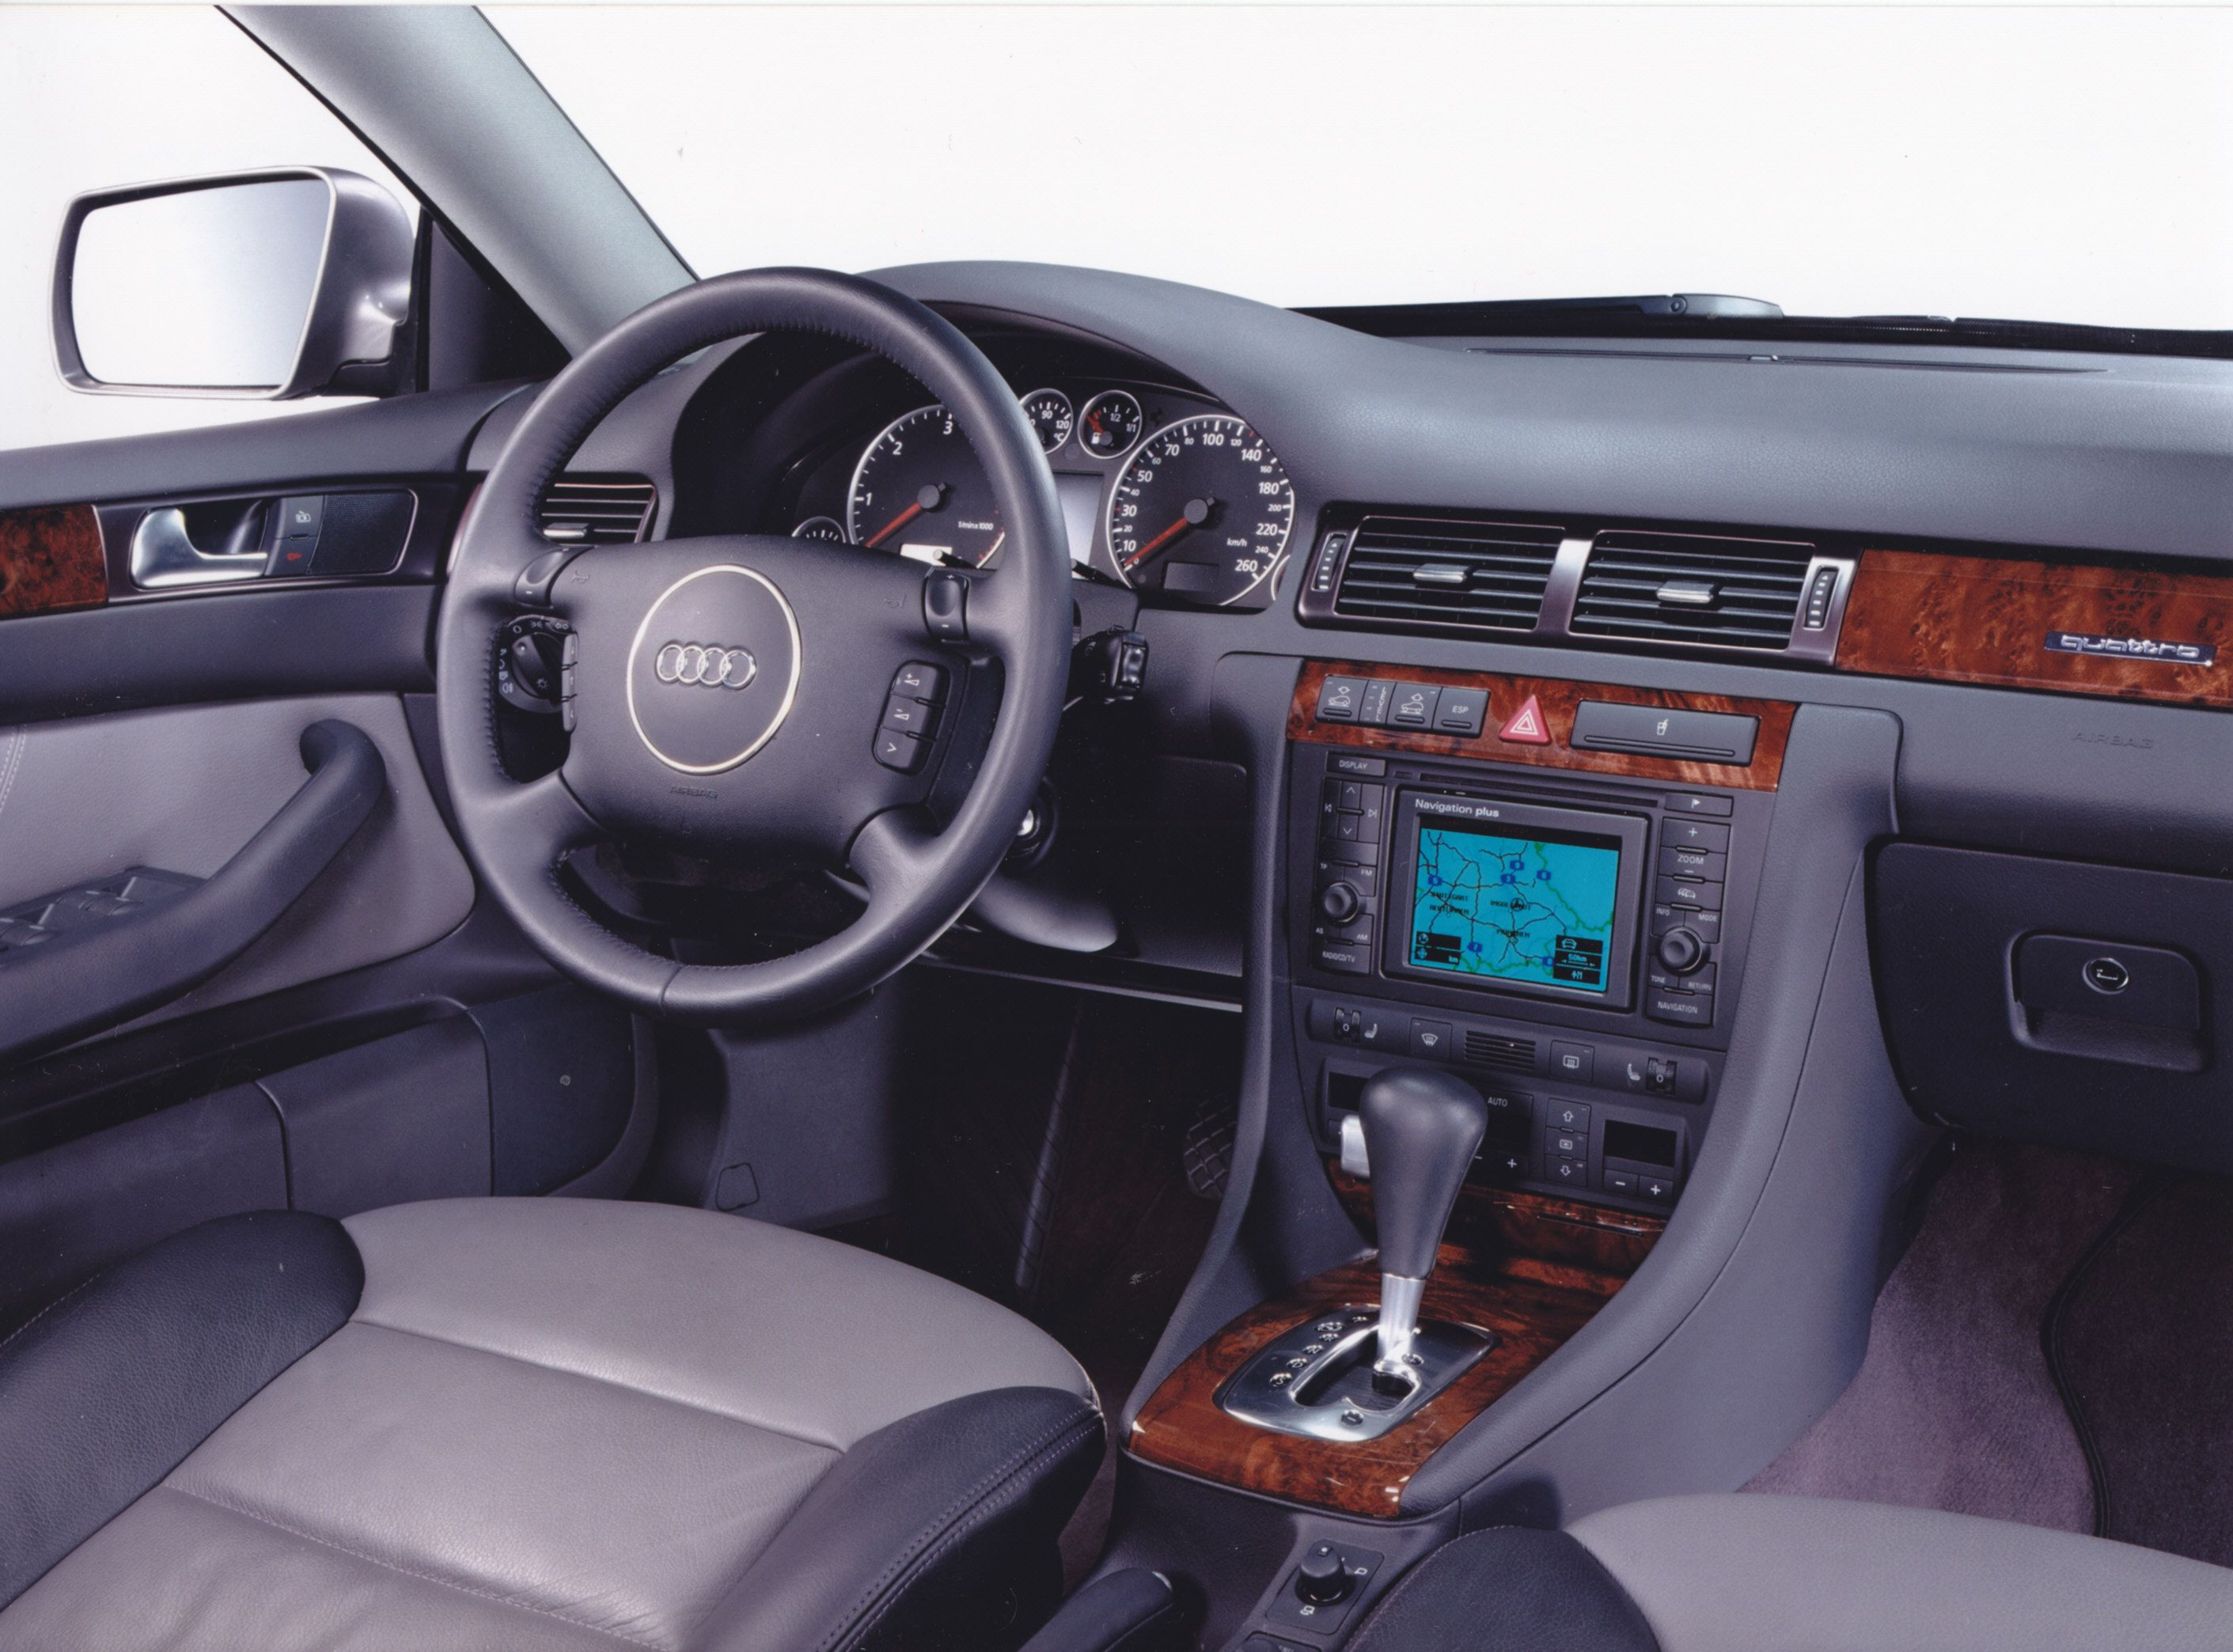 Audi Allroad Quattro 4 2 Dashboard 03 2002 Med Bilder